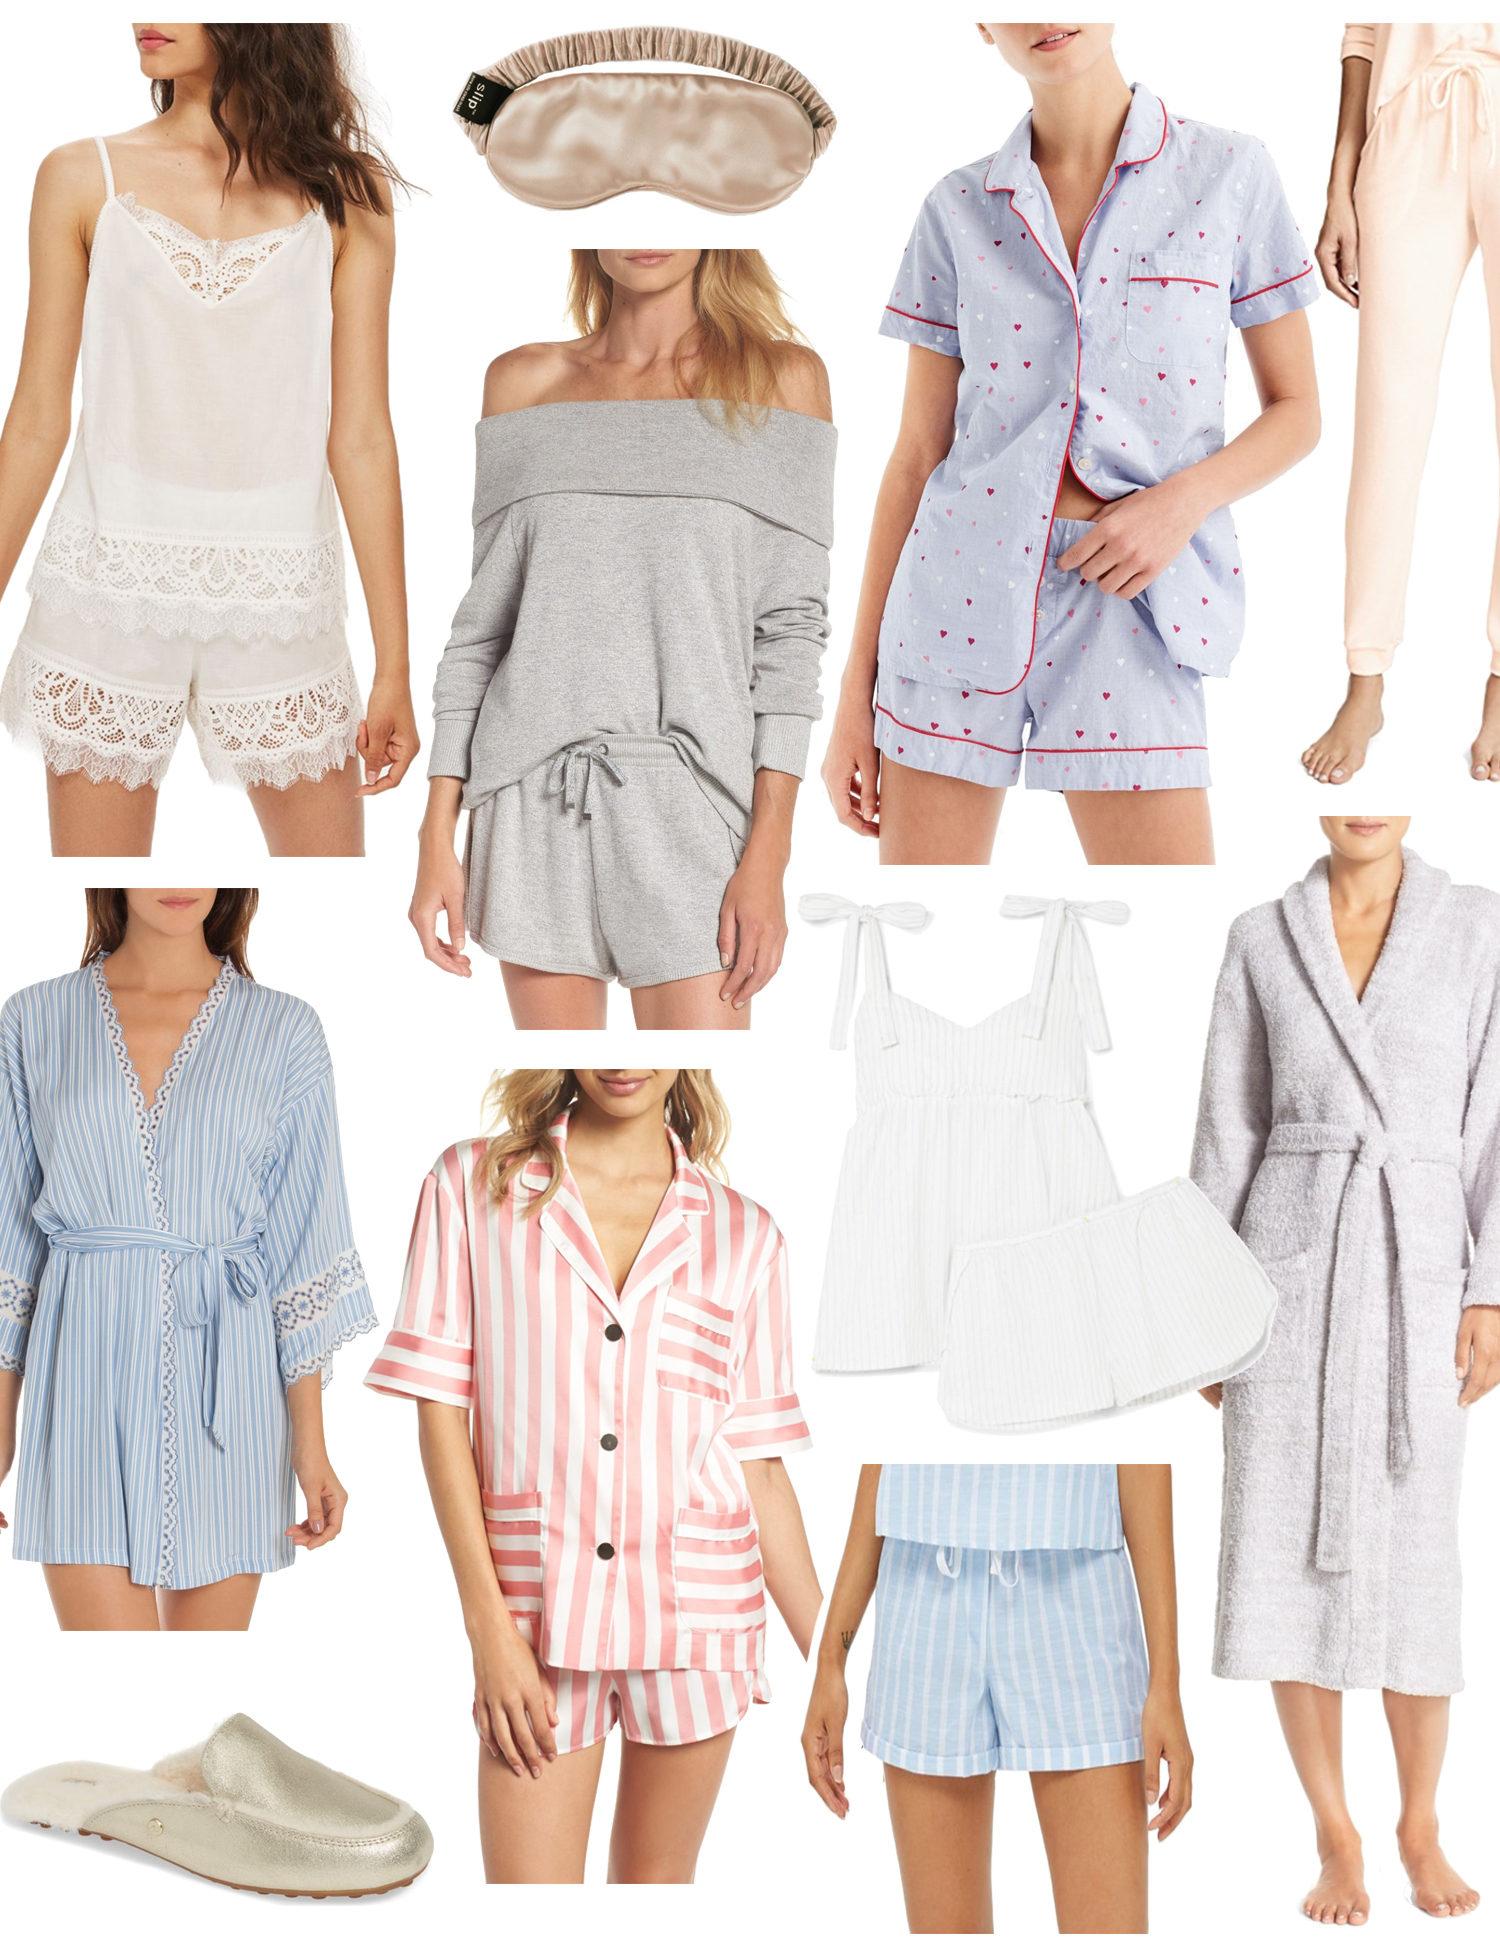 Pajamas-loungewear-nordstrom-comfy-pjs